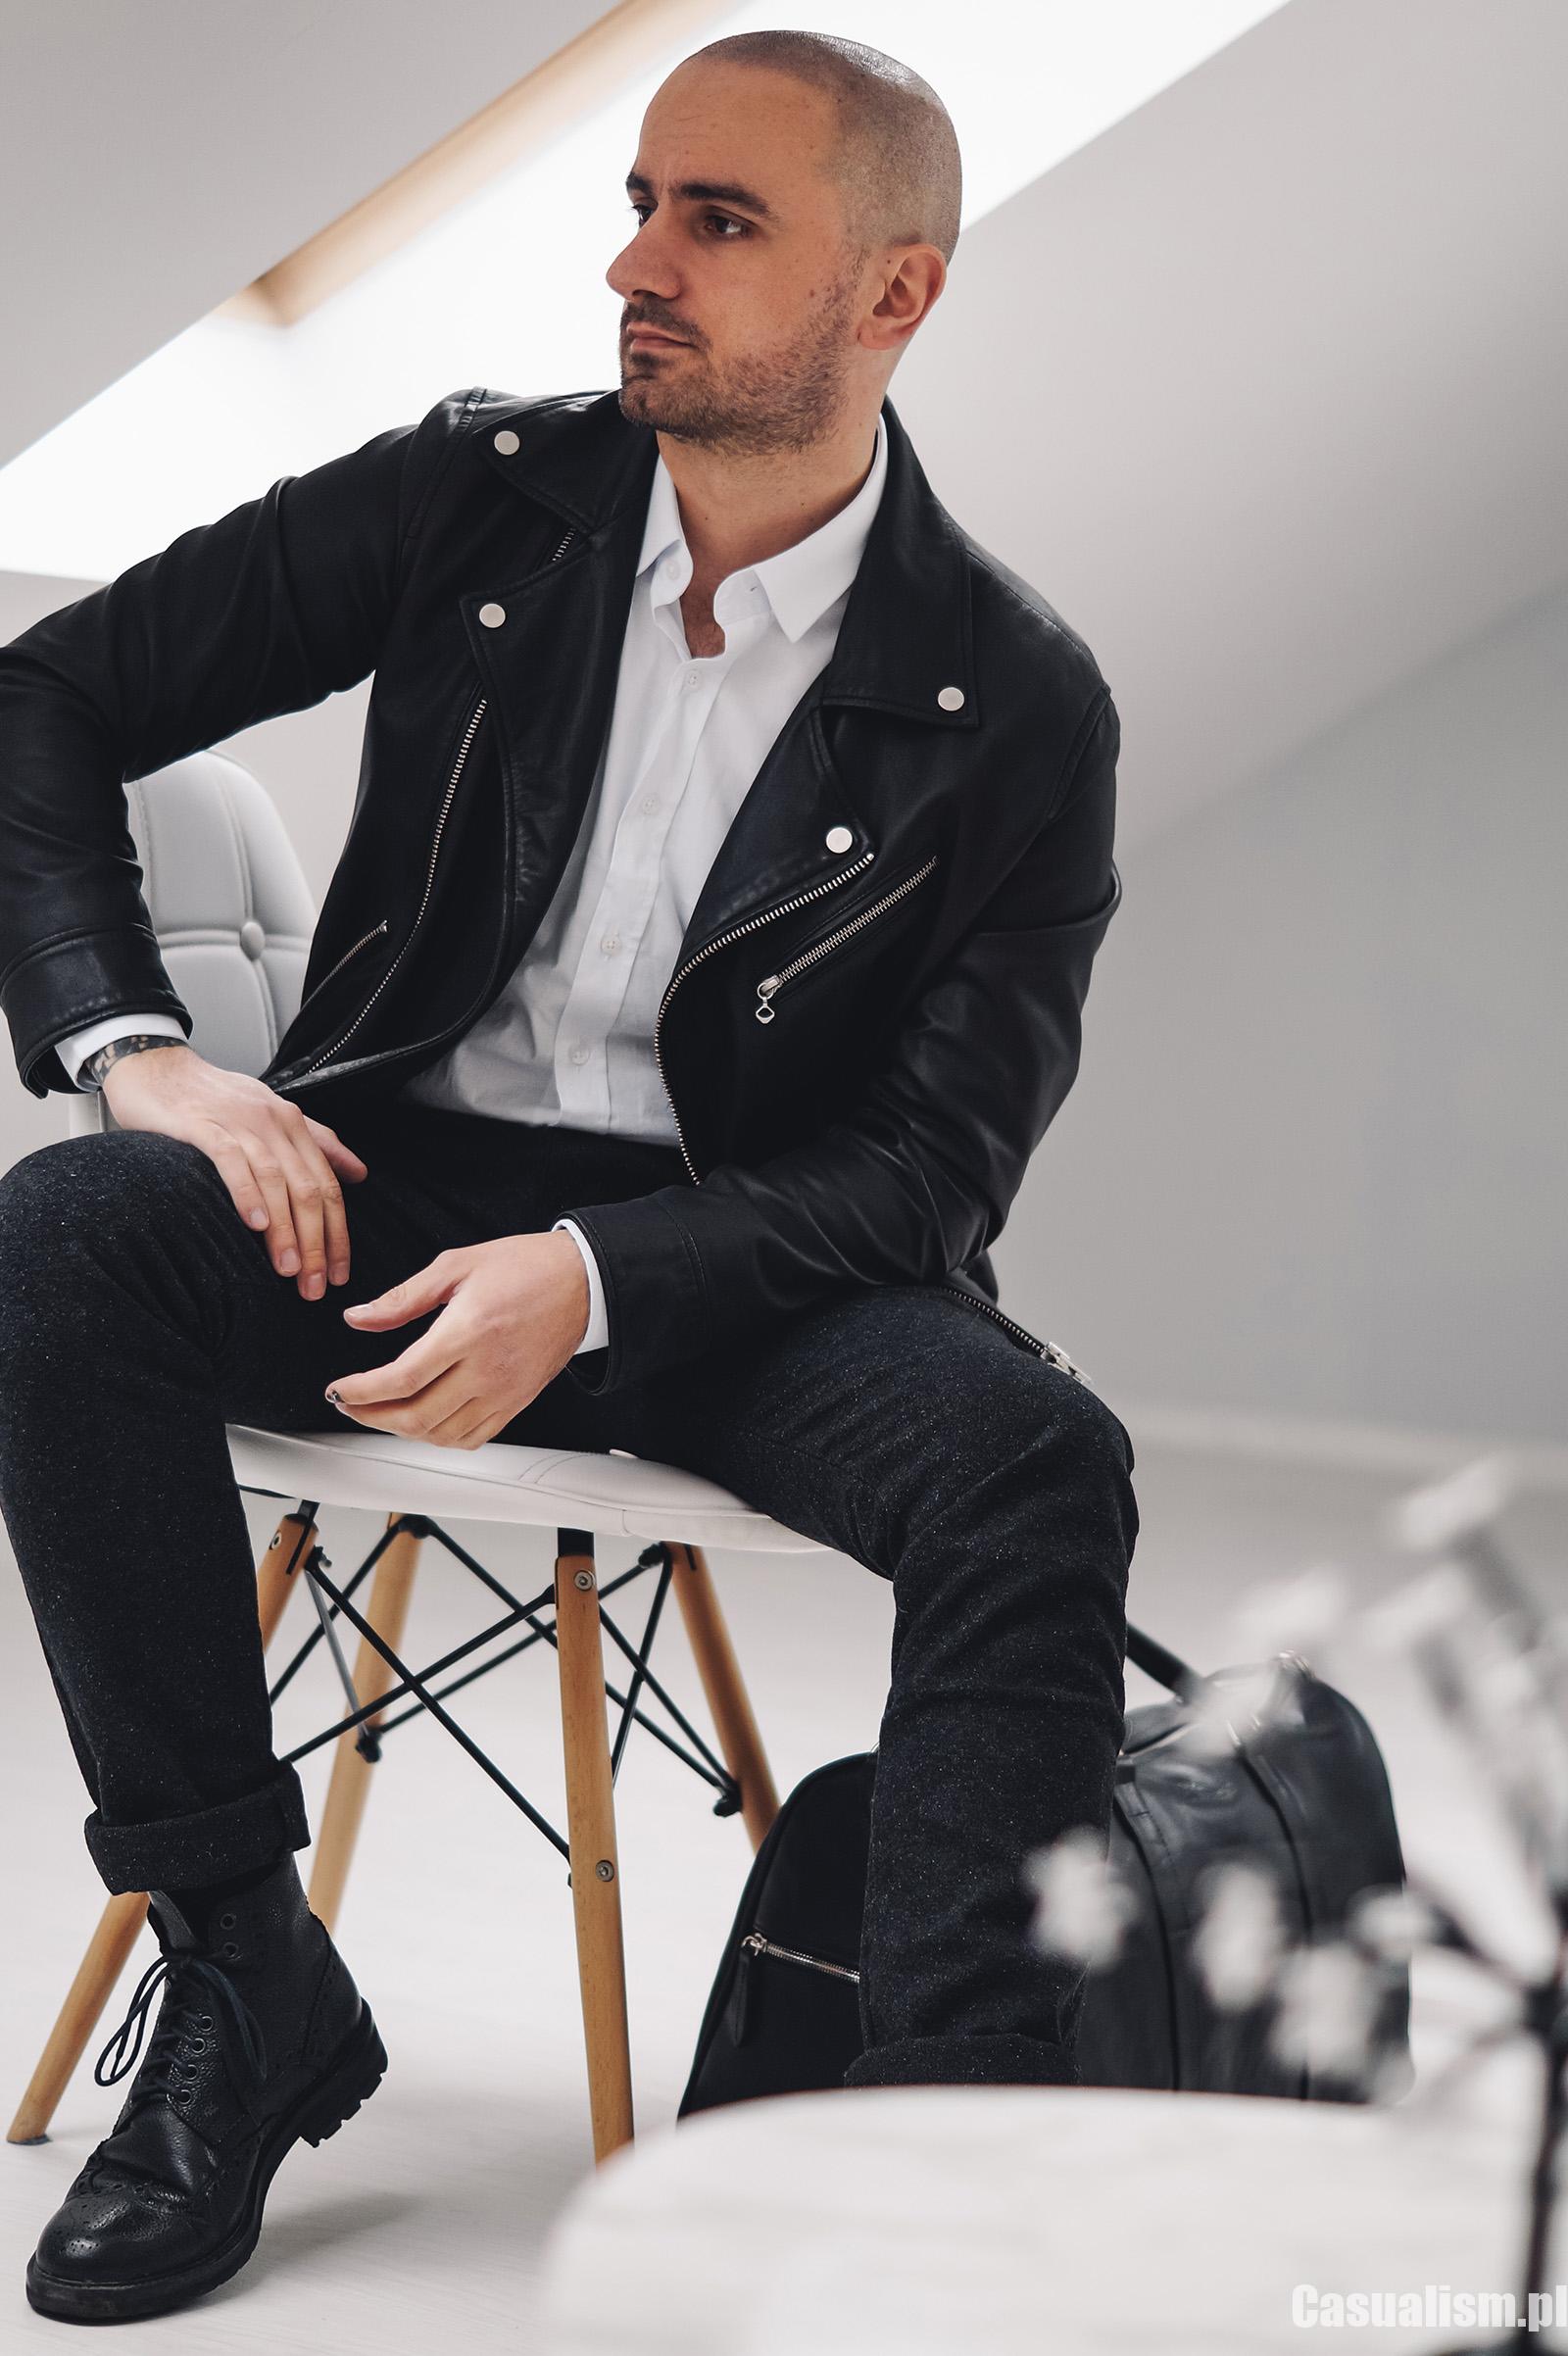 elegancka kurtka skórzana, kurtka ze skóry, skóra kurtka elegancka, eleganckie kurtki dla faceta ze skóry